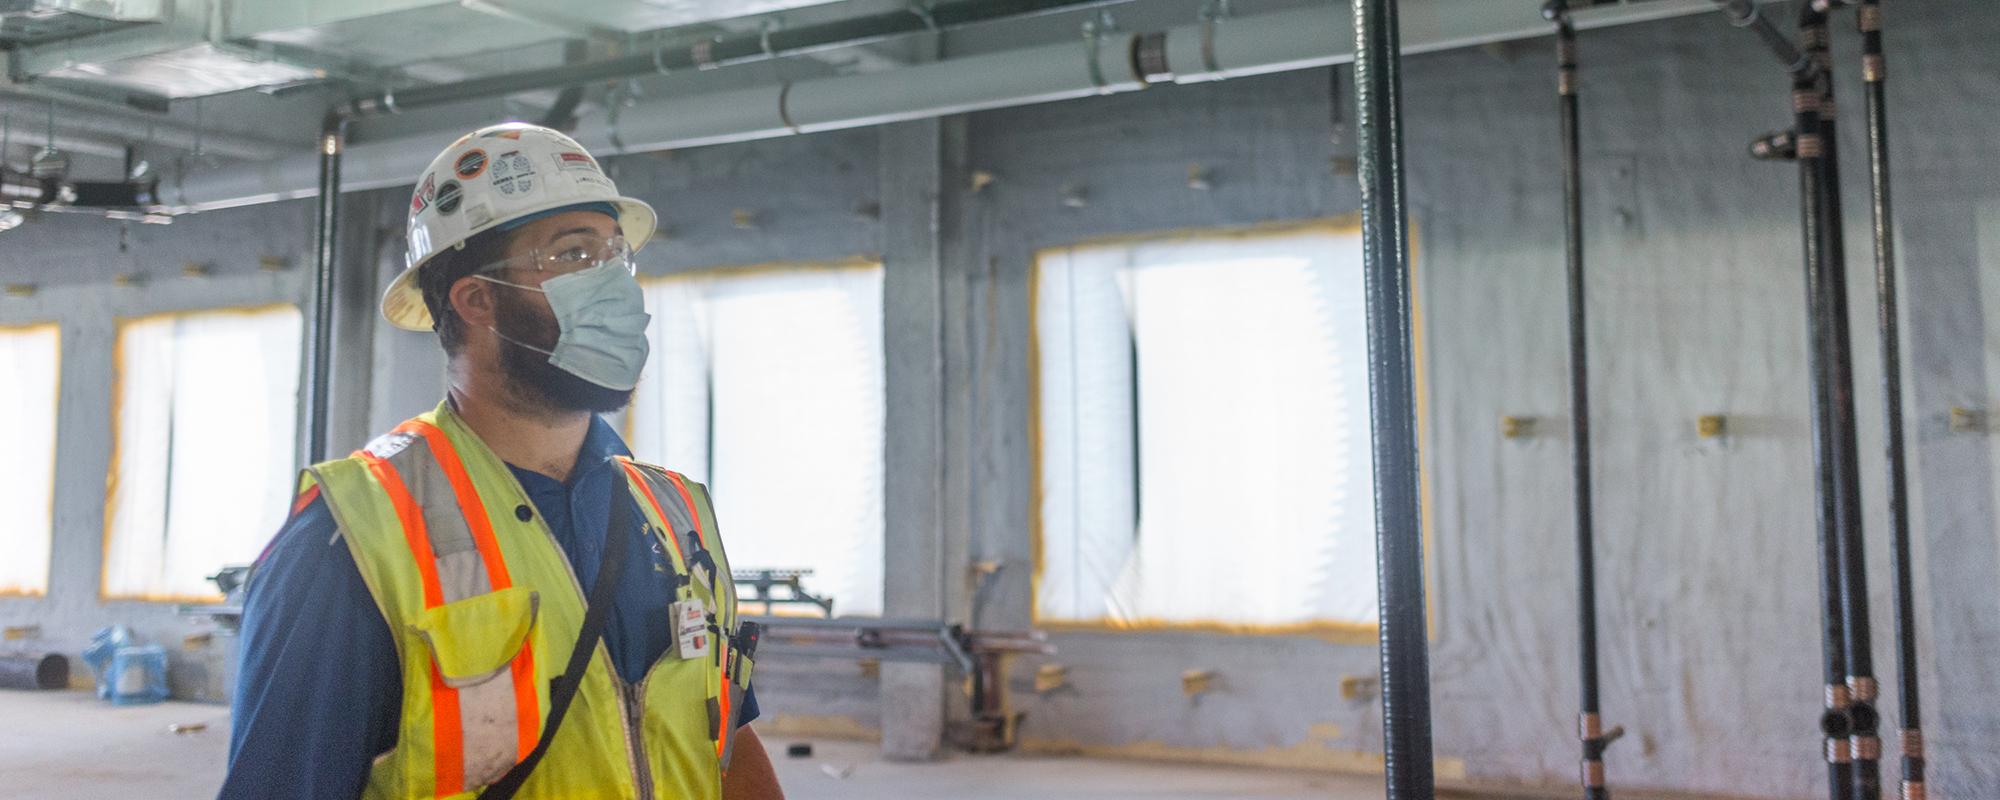 construction worker inspecting installation